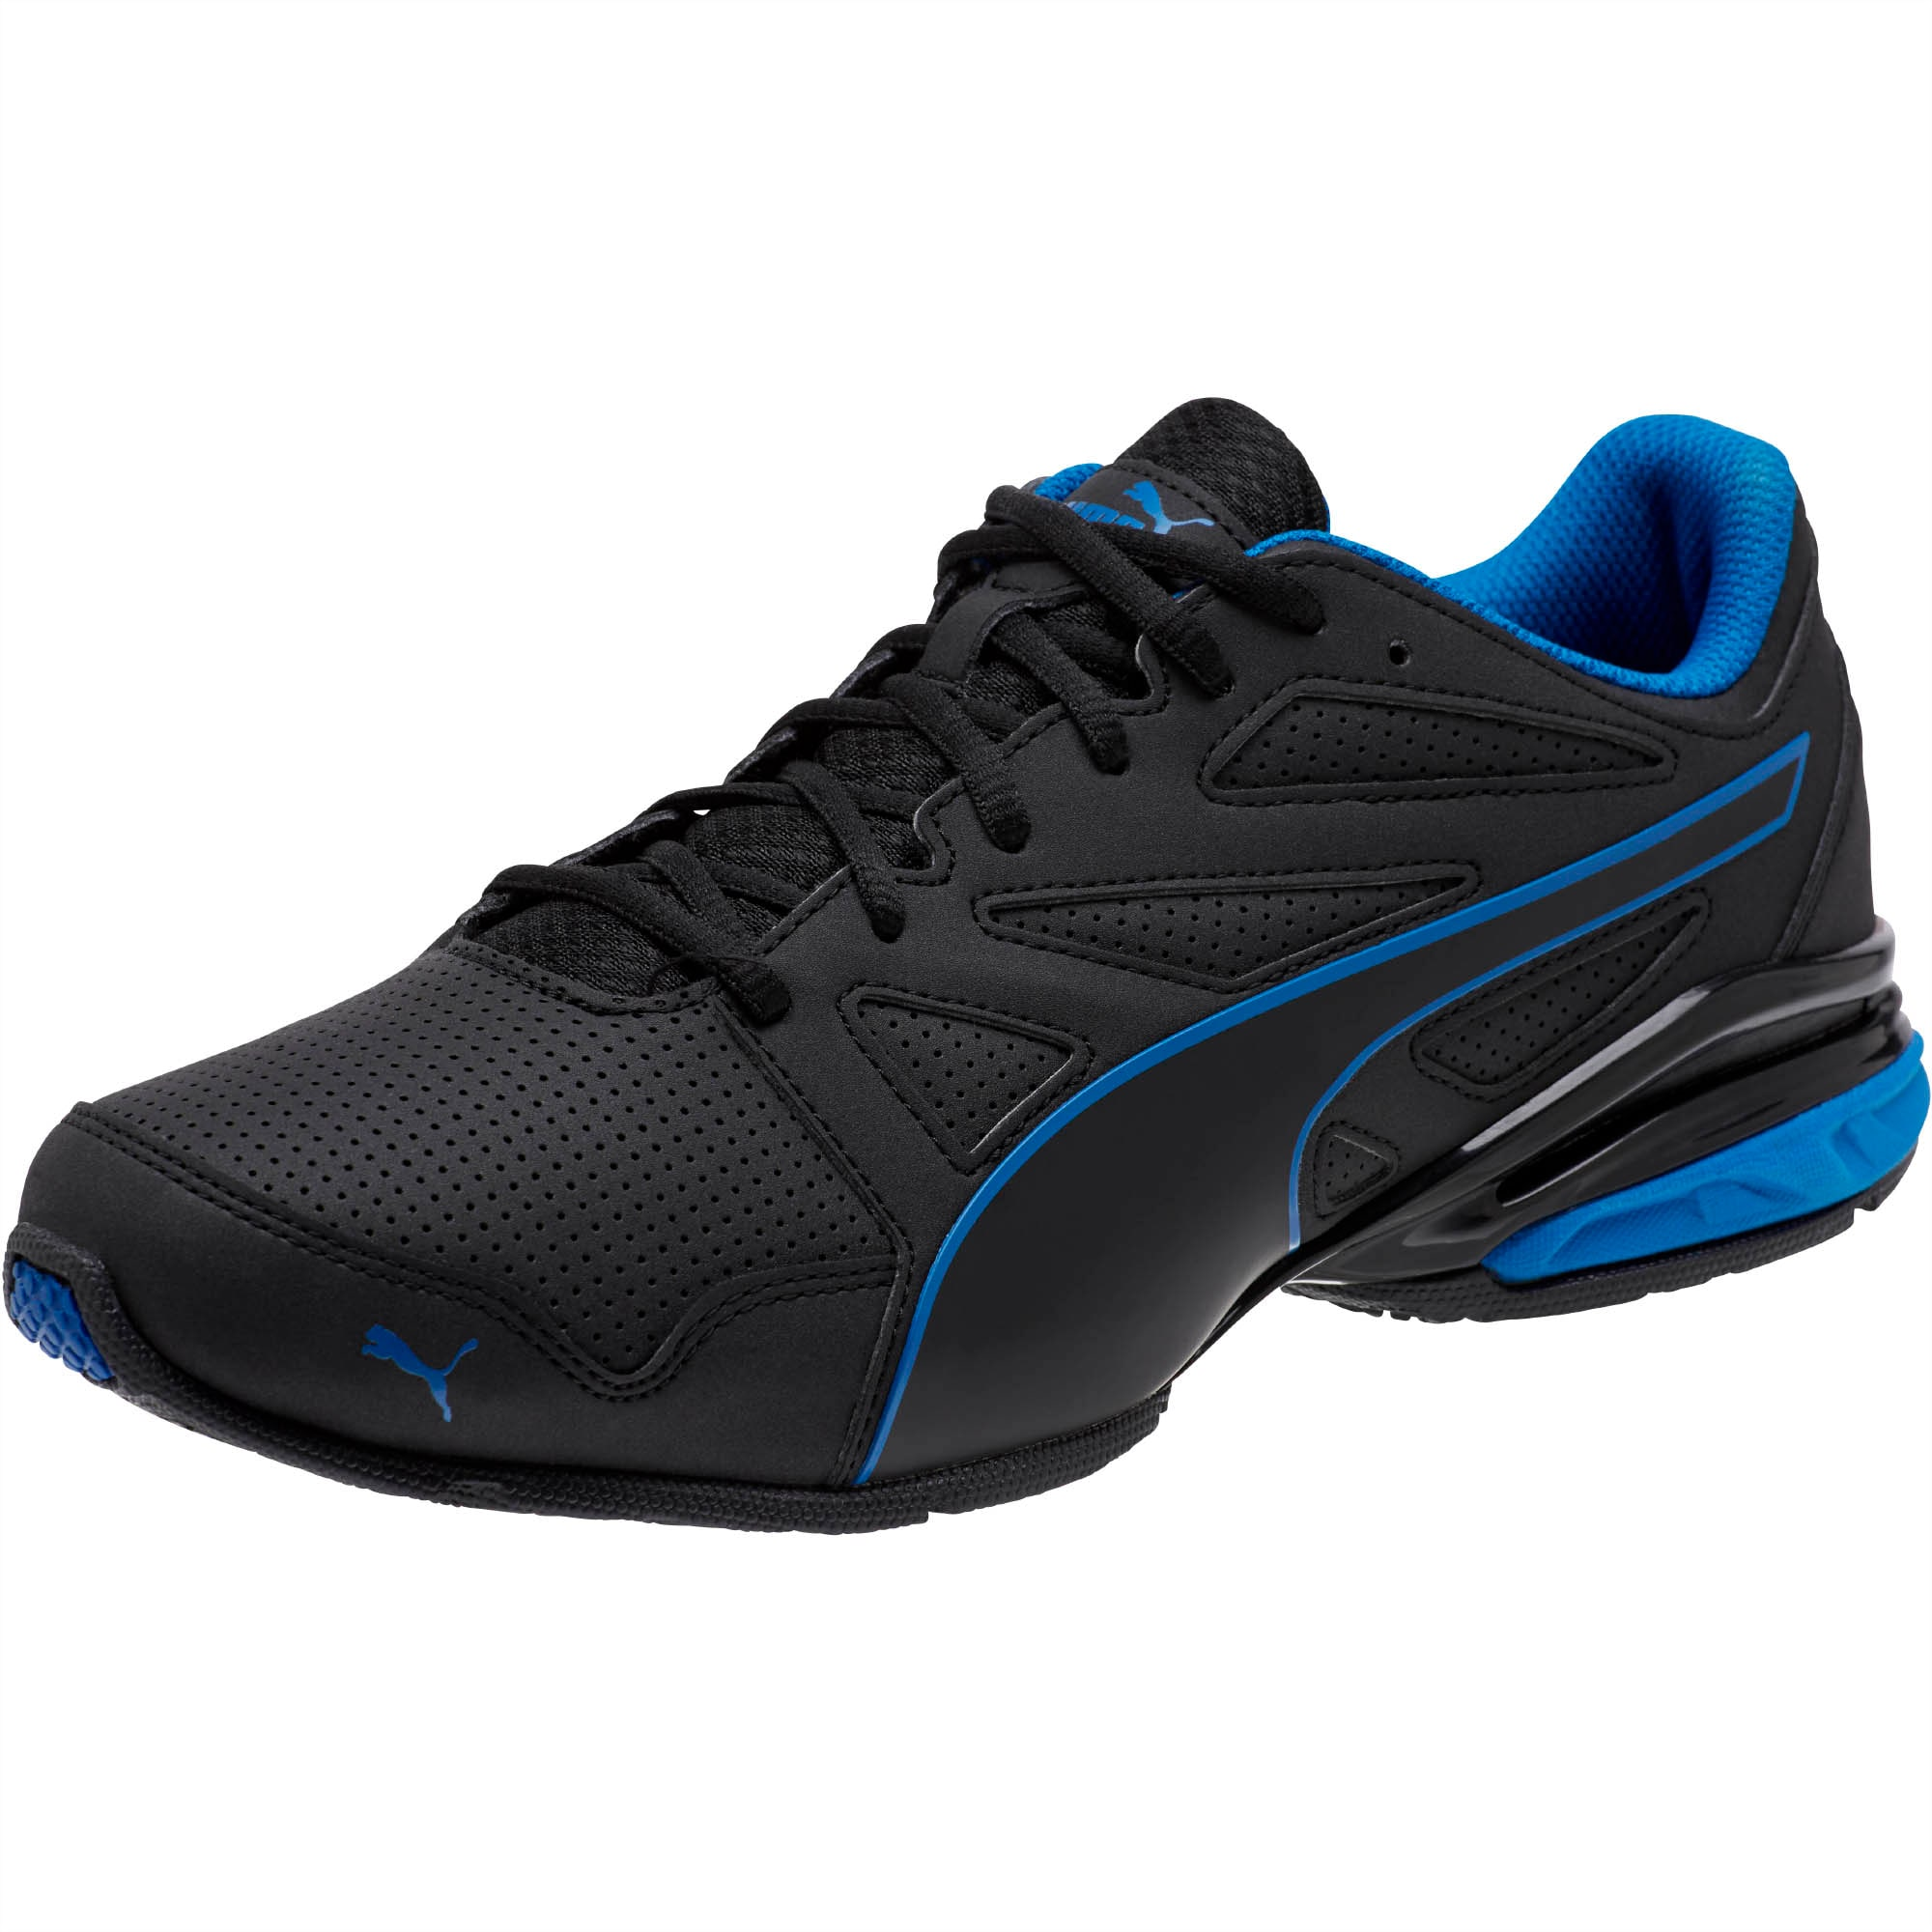 Comfortable Puma Men Shoes Puma Tazon Modern SL Running